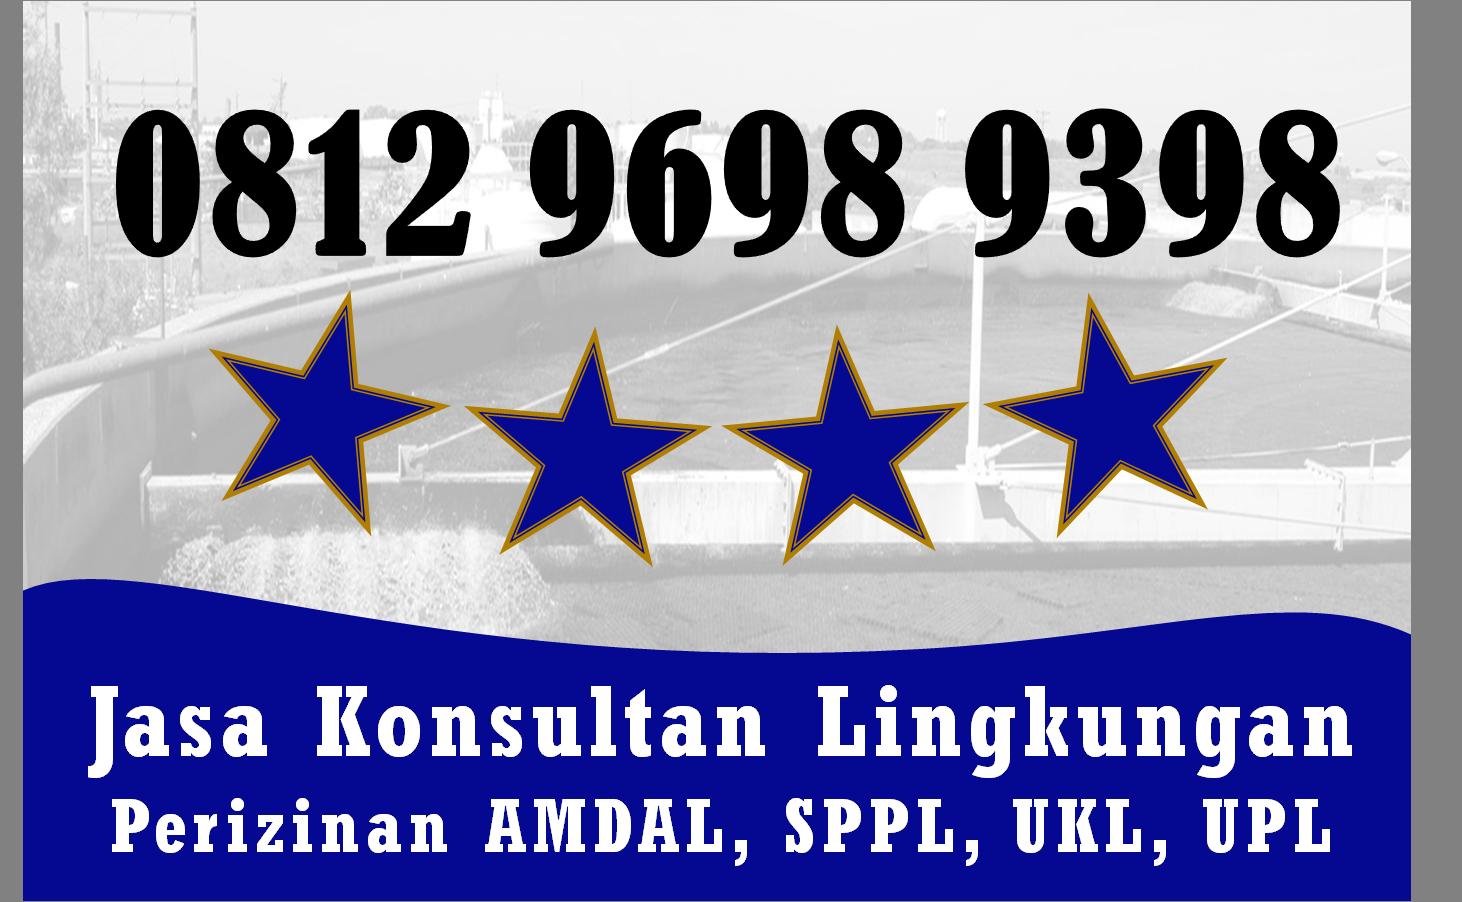 Kini Hadir Telp Wa 0812 9698 9398 Makalah Ukl Upl Kab Barito Selatan Kalimantan Tengah Kota Bukittinggi Kota Manado Kota Balikpapan